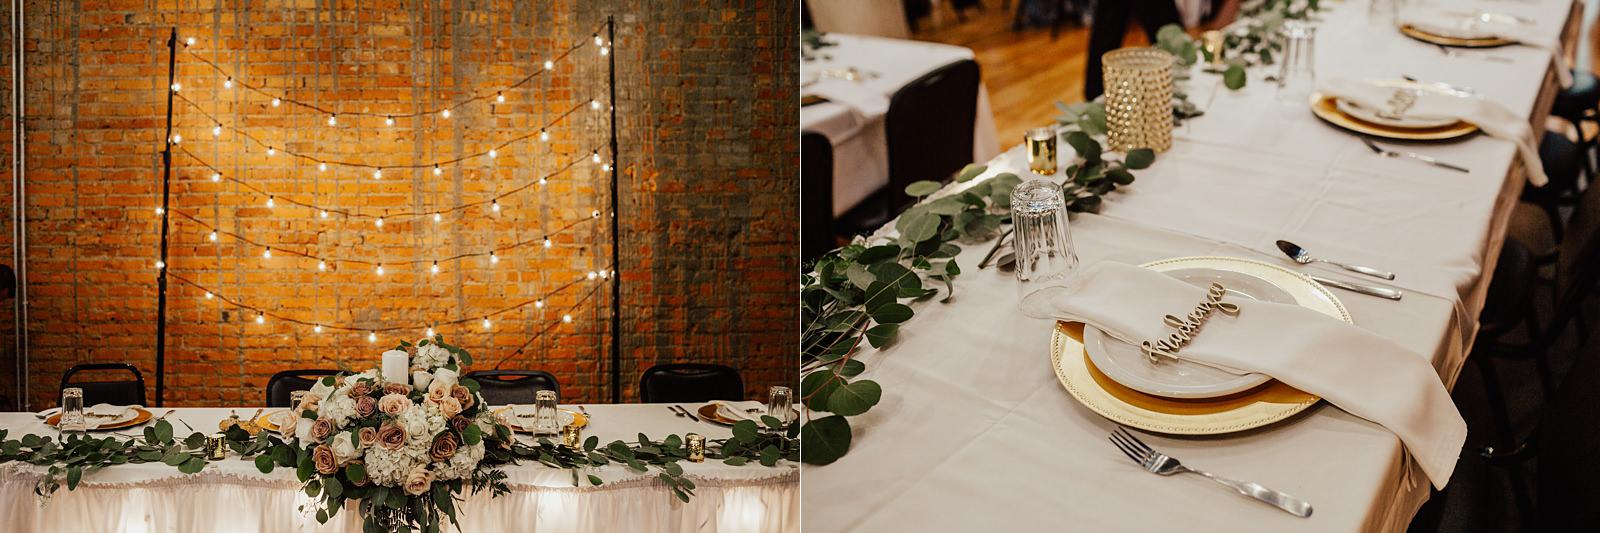 Molly & Bradley Modern Boho Wedding at The University Club Quad Cities-43.jpg